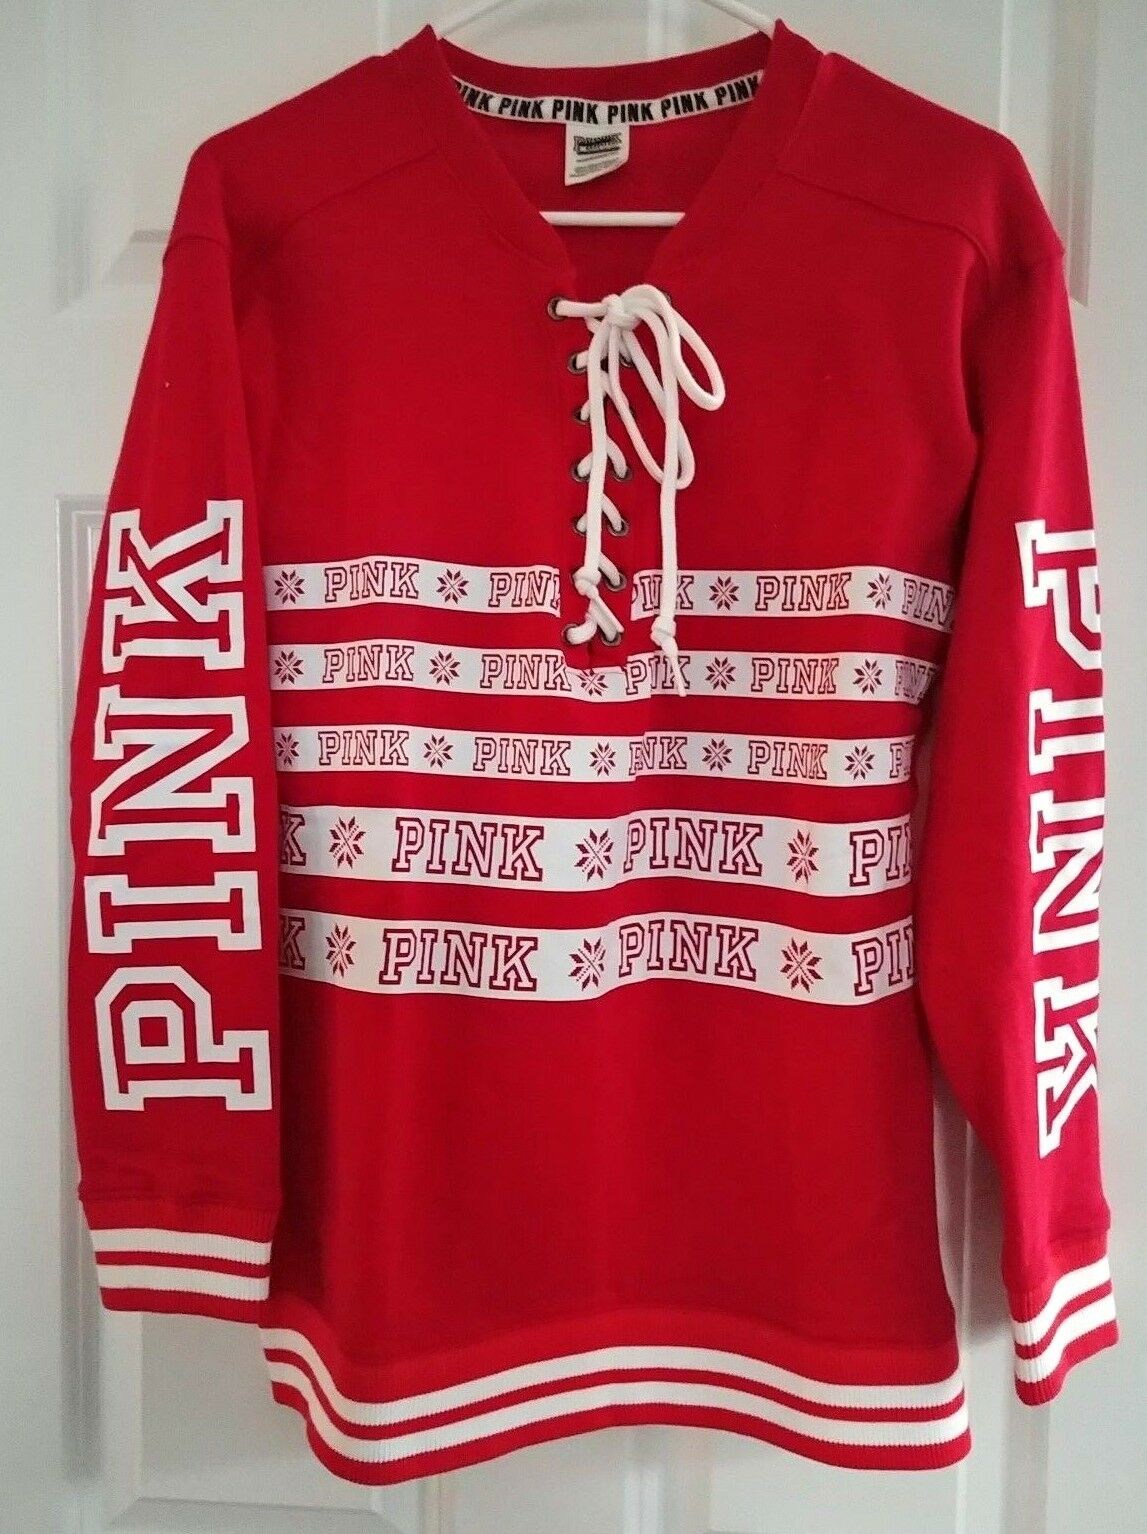 New VICTORIA'S SECRET PINK lace up fair isle sweatshirt shirt top xs s